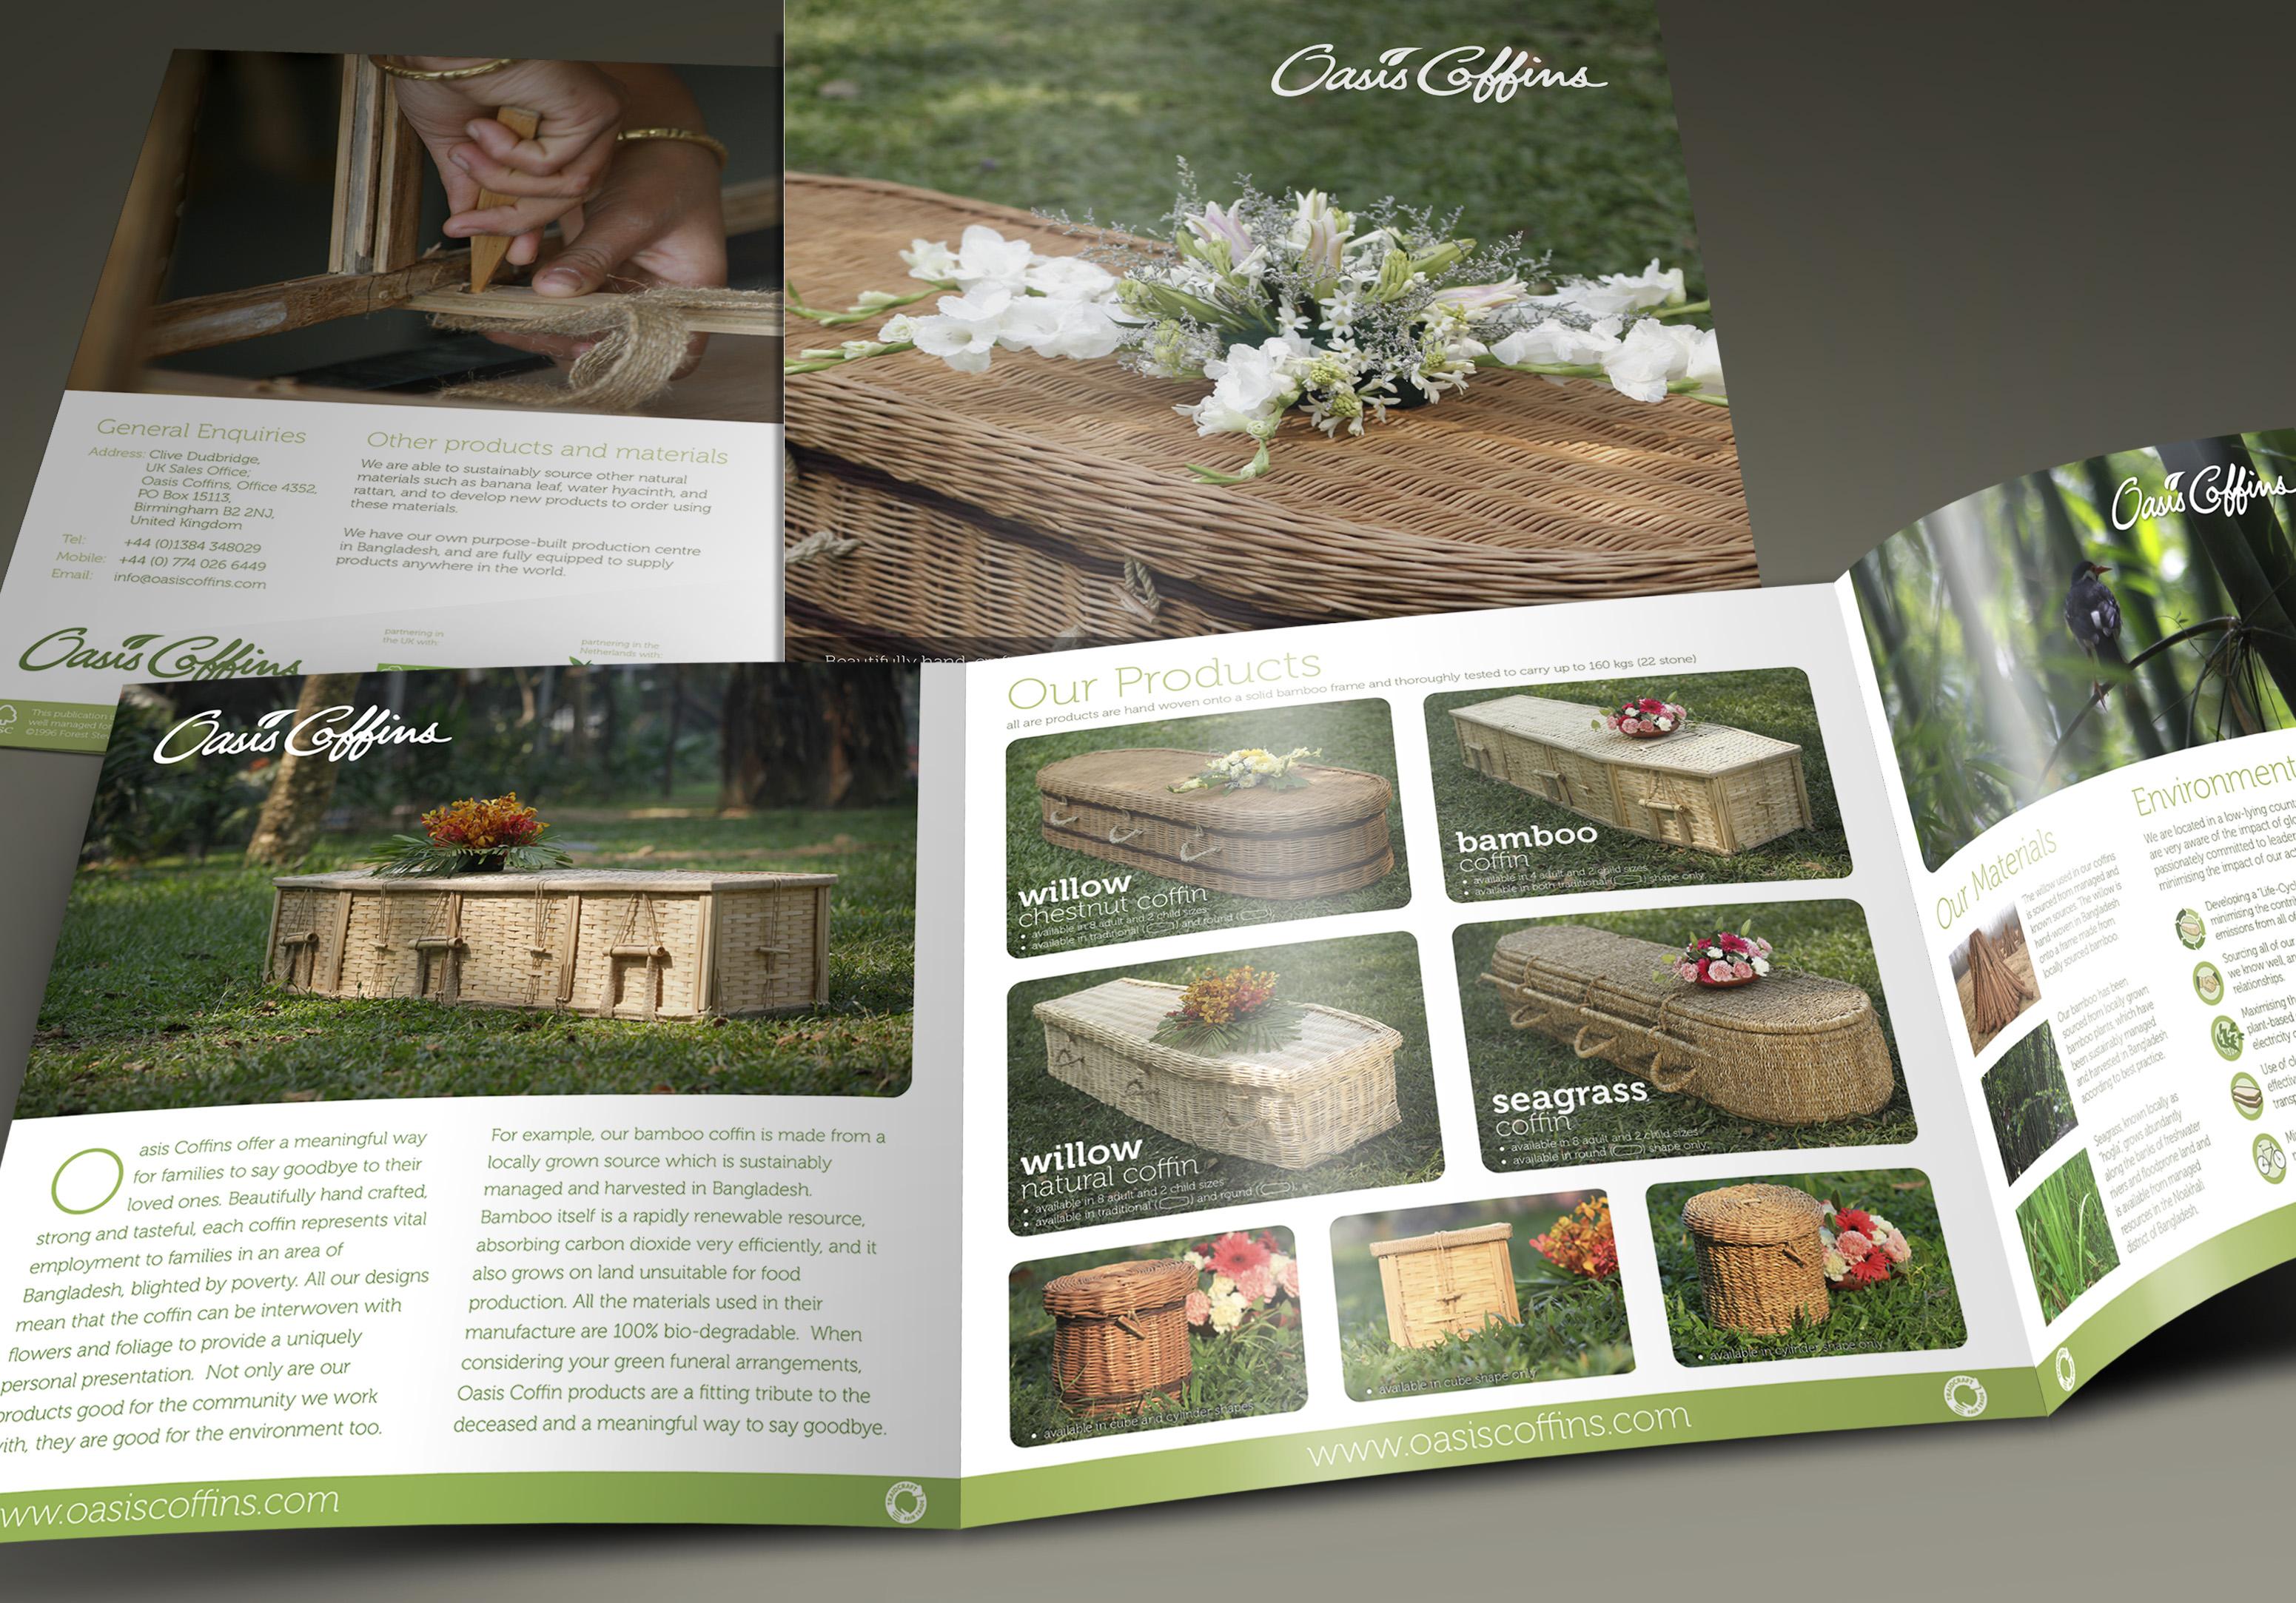 Oasis Coffins Brochure